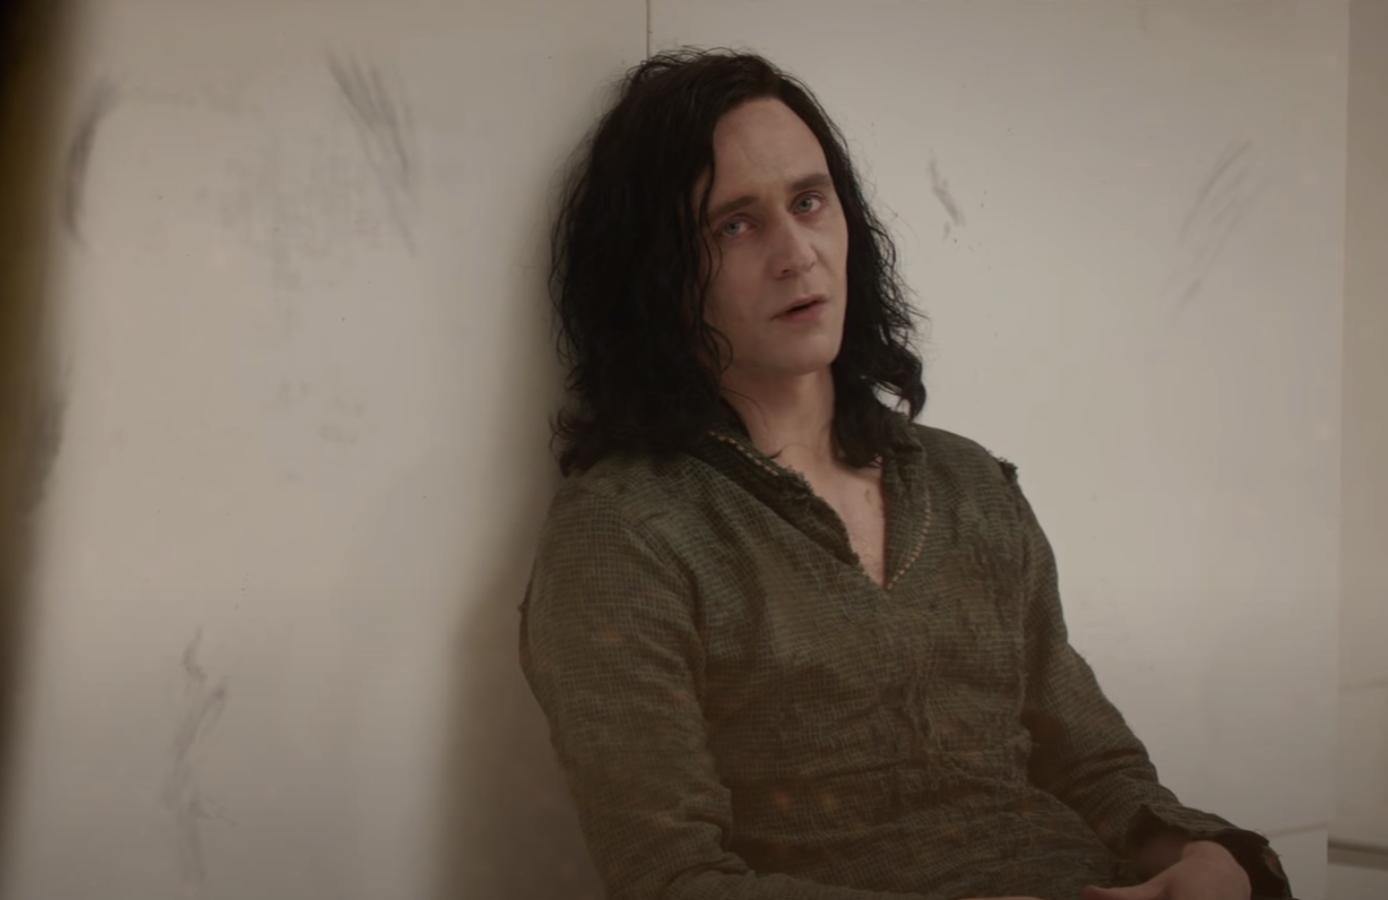 Loki's hair looked disheveled but naturally wavy after Frigga's death